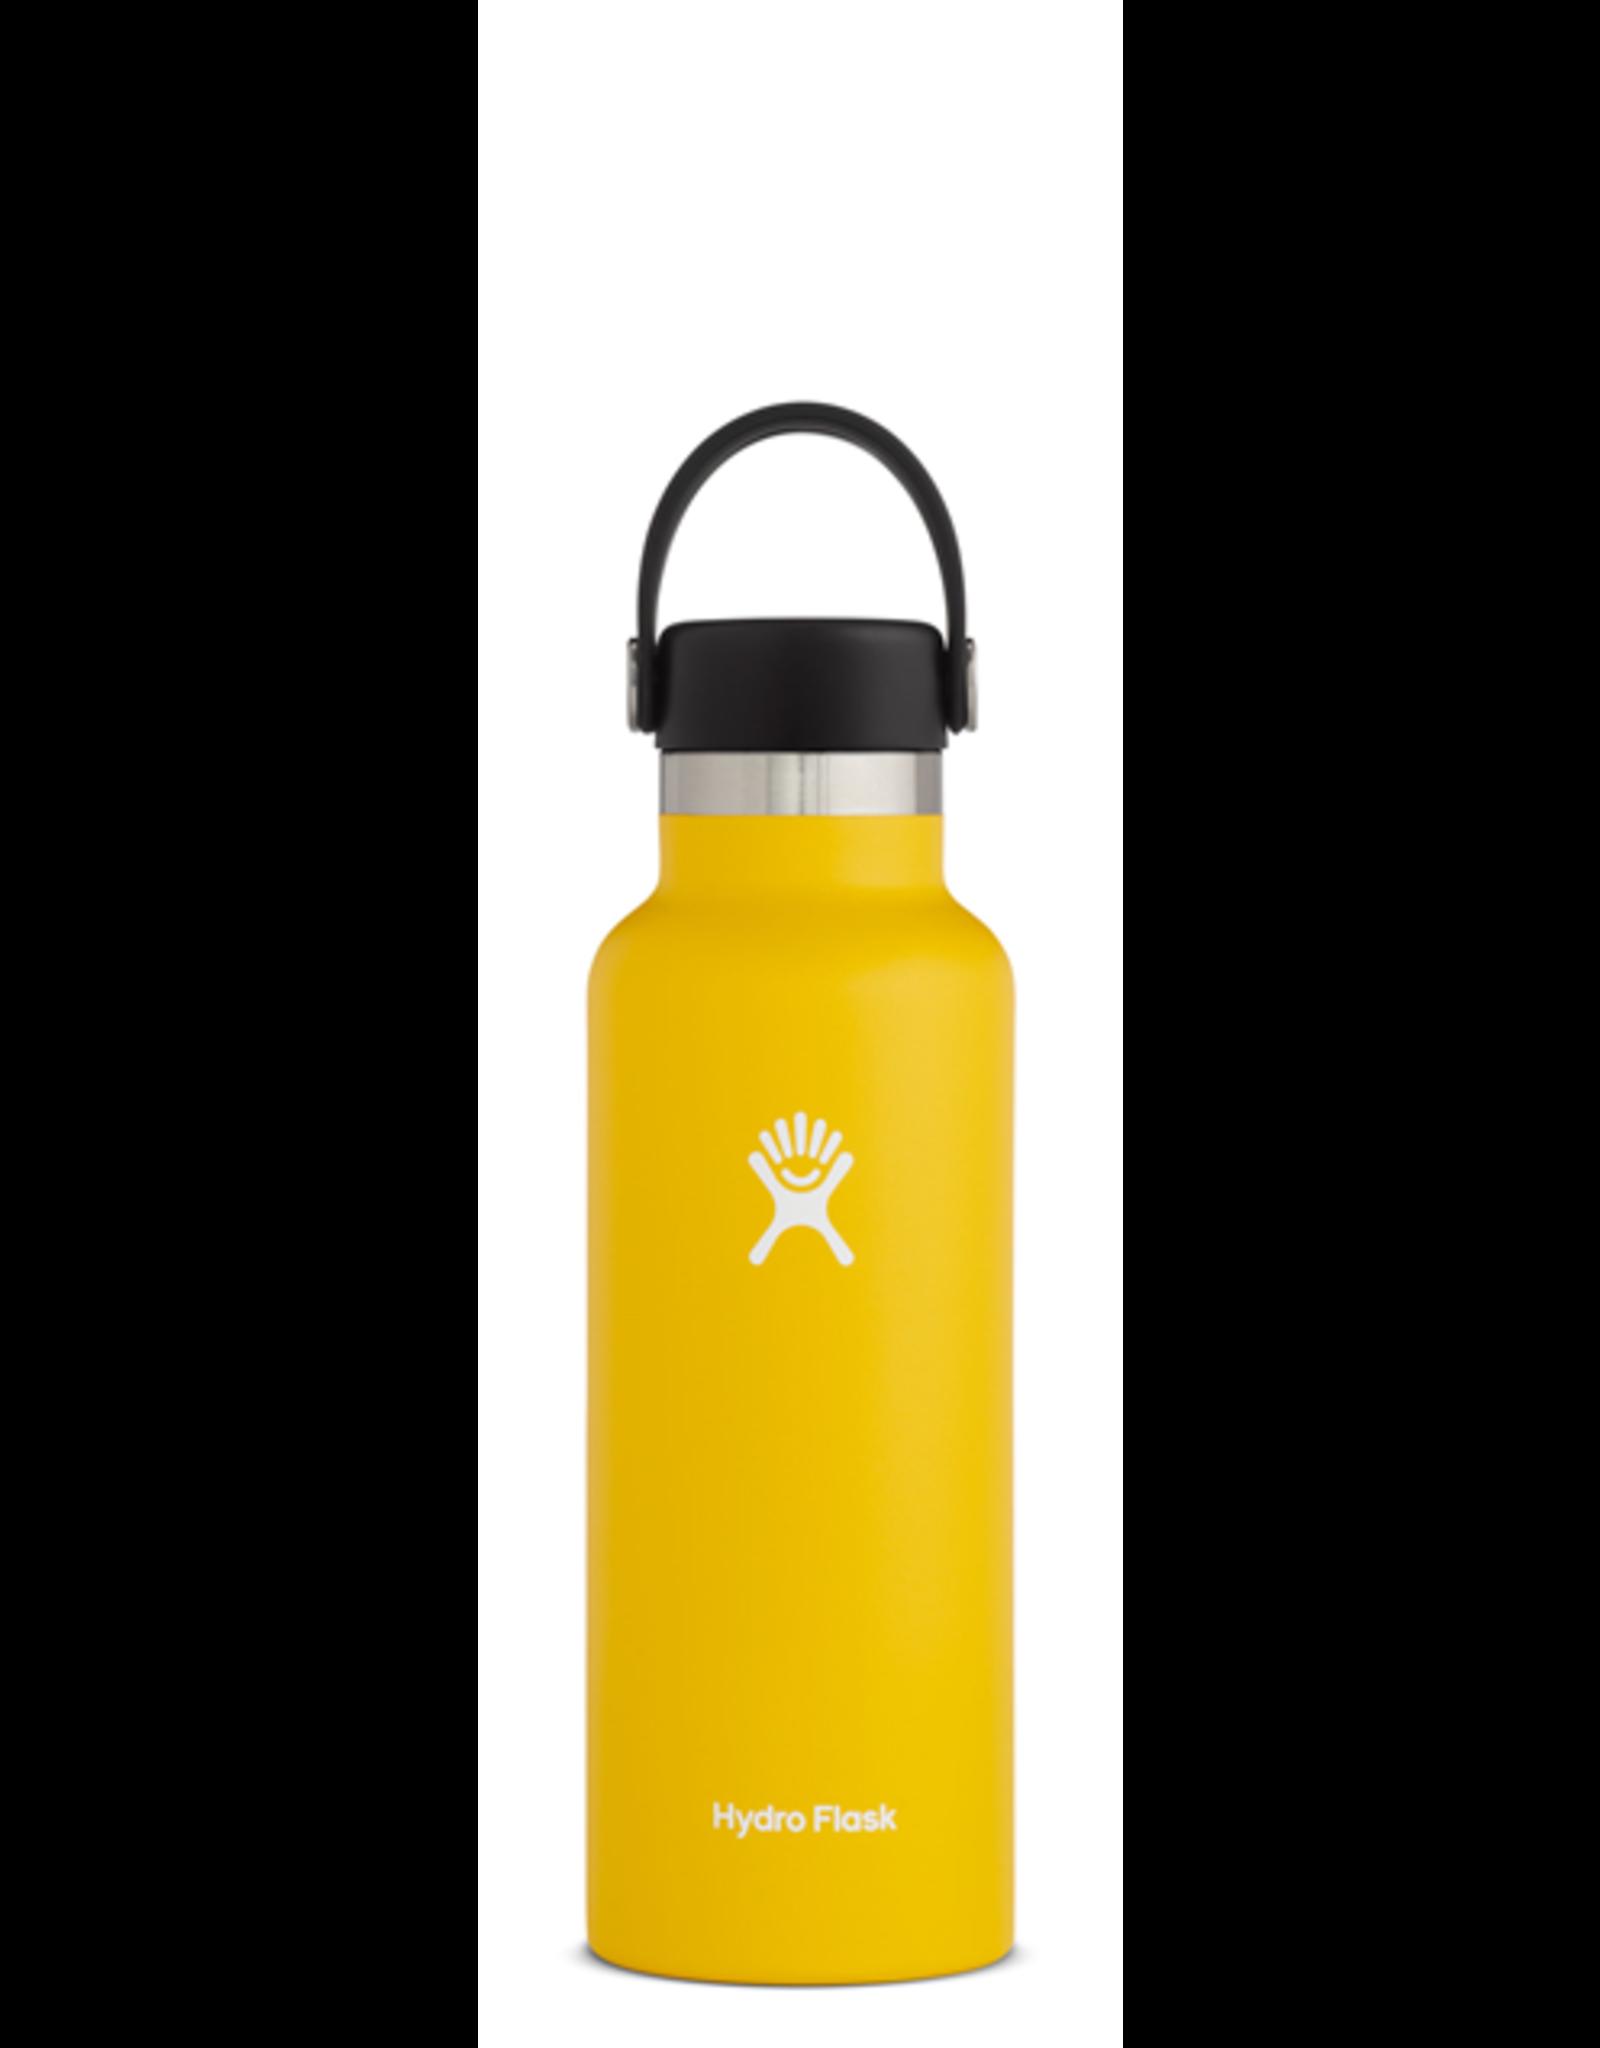 Hydro Flask Hydro Flask - 18 OZ. STANDARD MOUTH